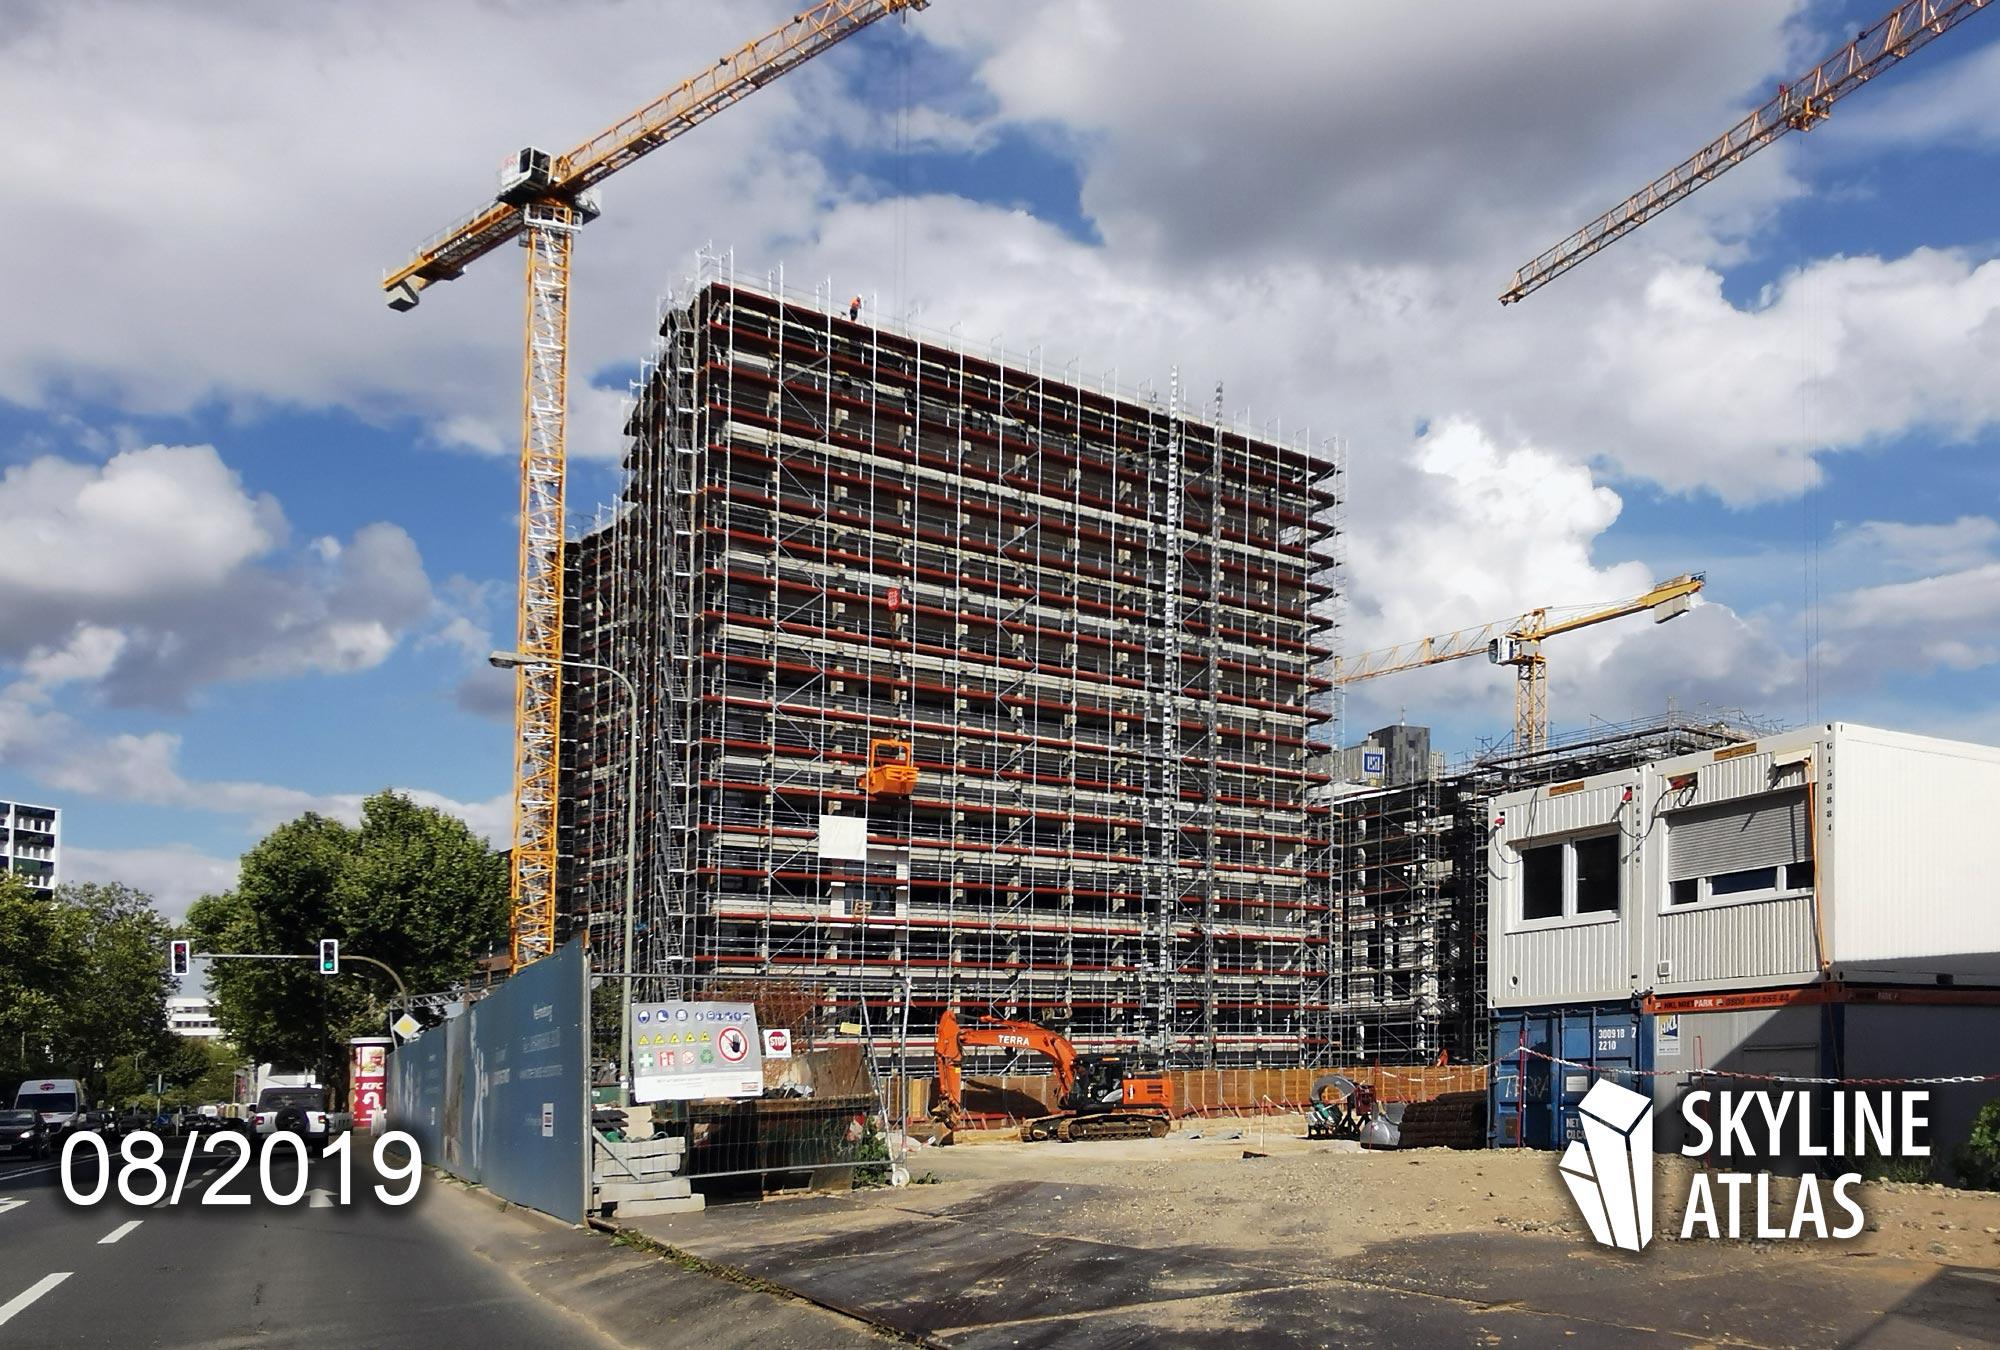 Sky Eschborn - Office building Eschborn - Office Eschborn - Office building in the economic center under construction - Office building in August 2019